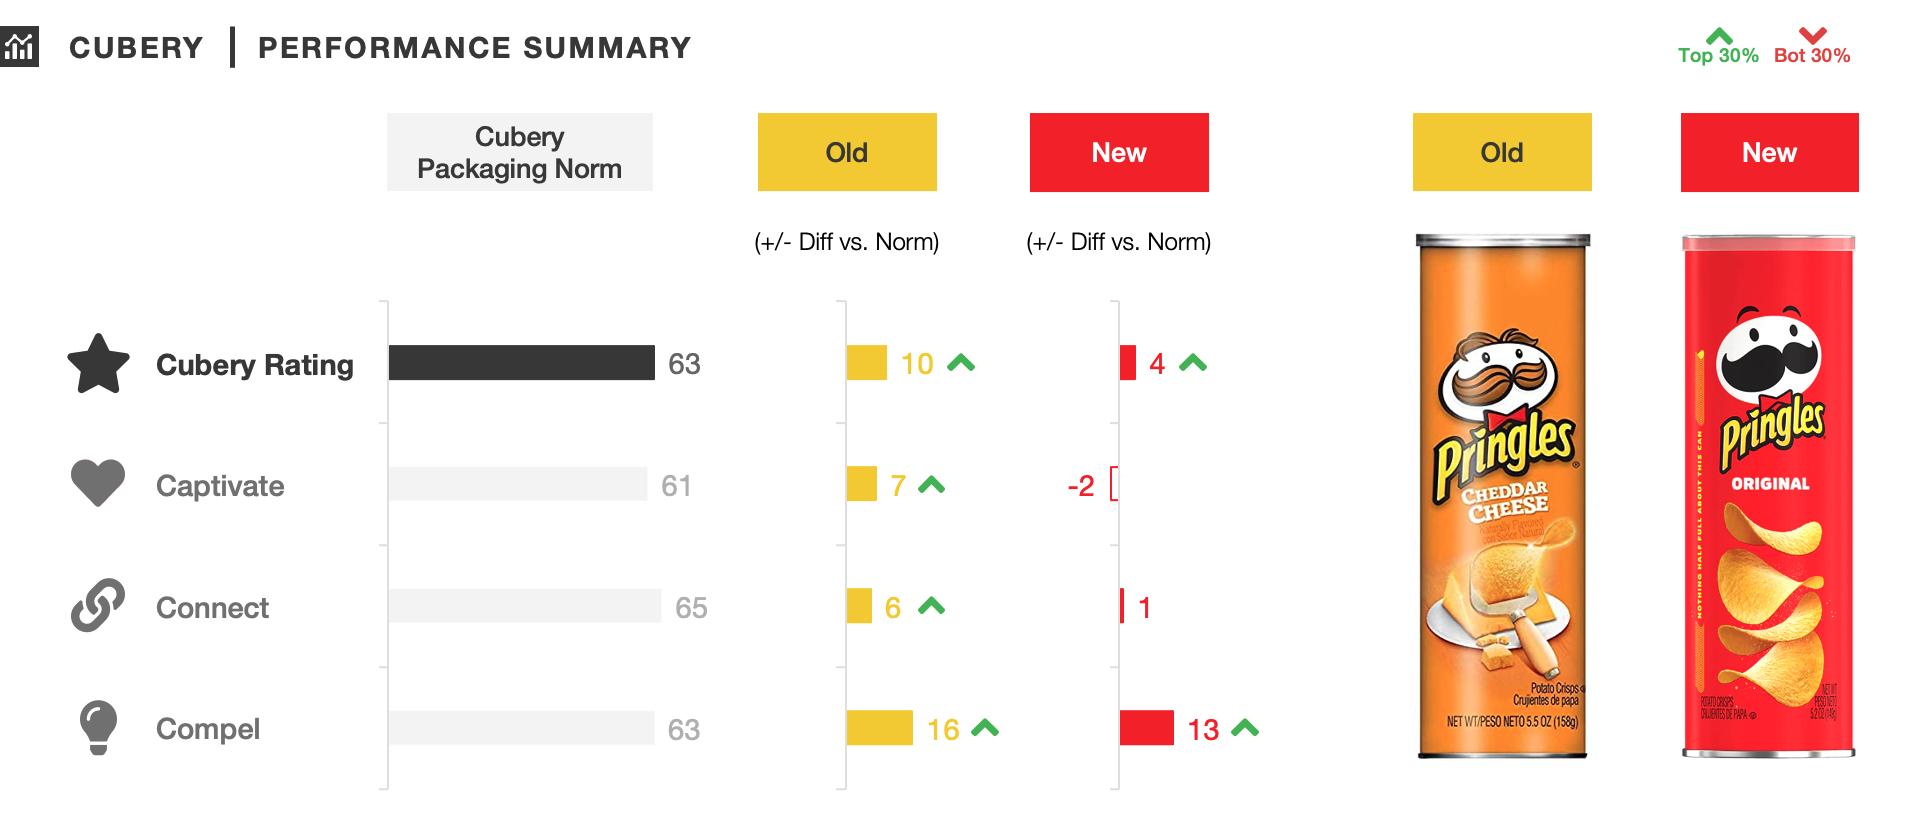 Pringles revamped Packaging Testing - Performance Summary - Cubery